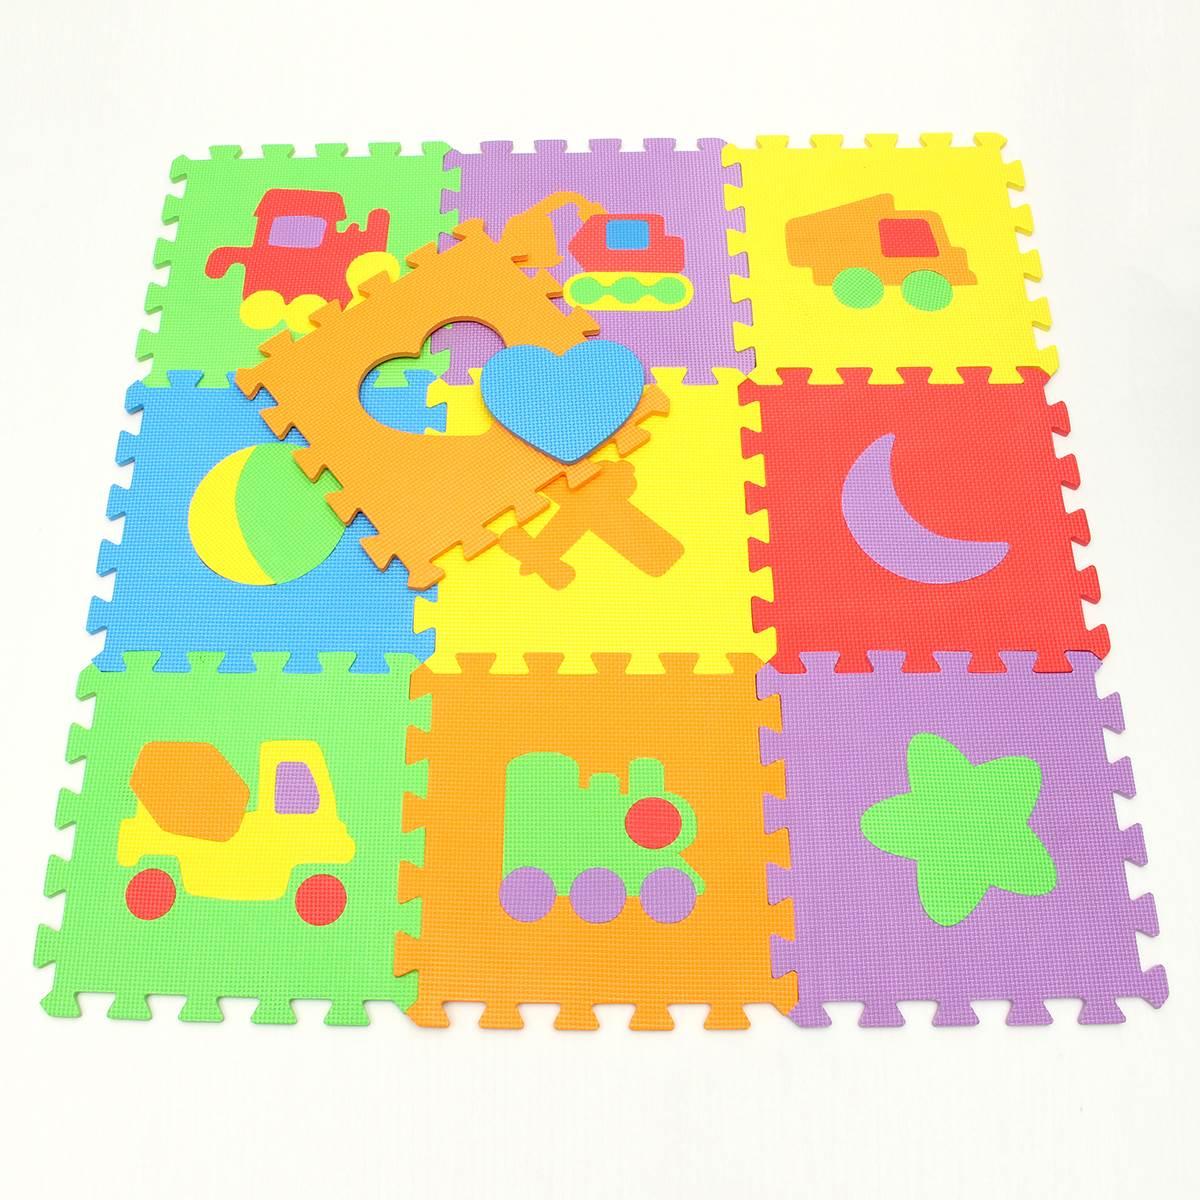 Baby sleeping mat ocean world baby play mat buy baby sleeping mat - New Arrival 30 30cm 10pcs Set Puzzle Carpet Baby Play Mat Floor Puzzle Mat